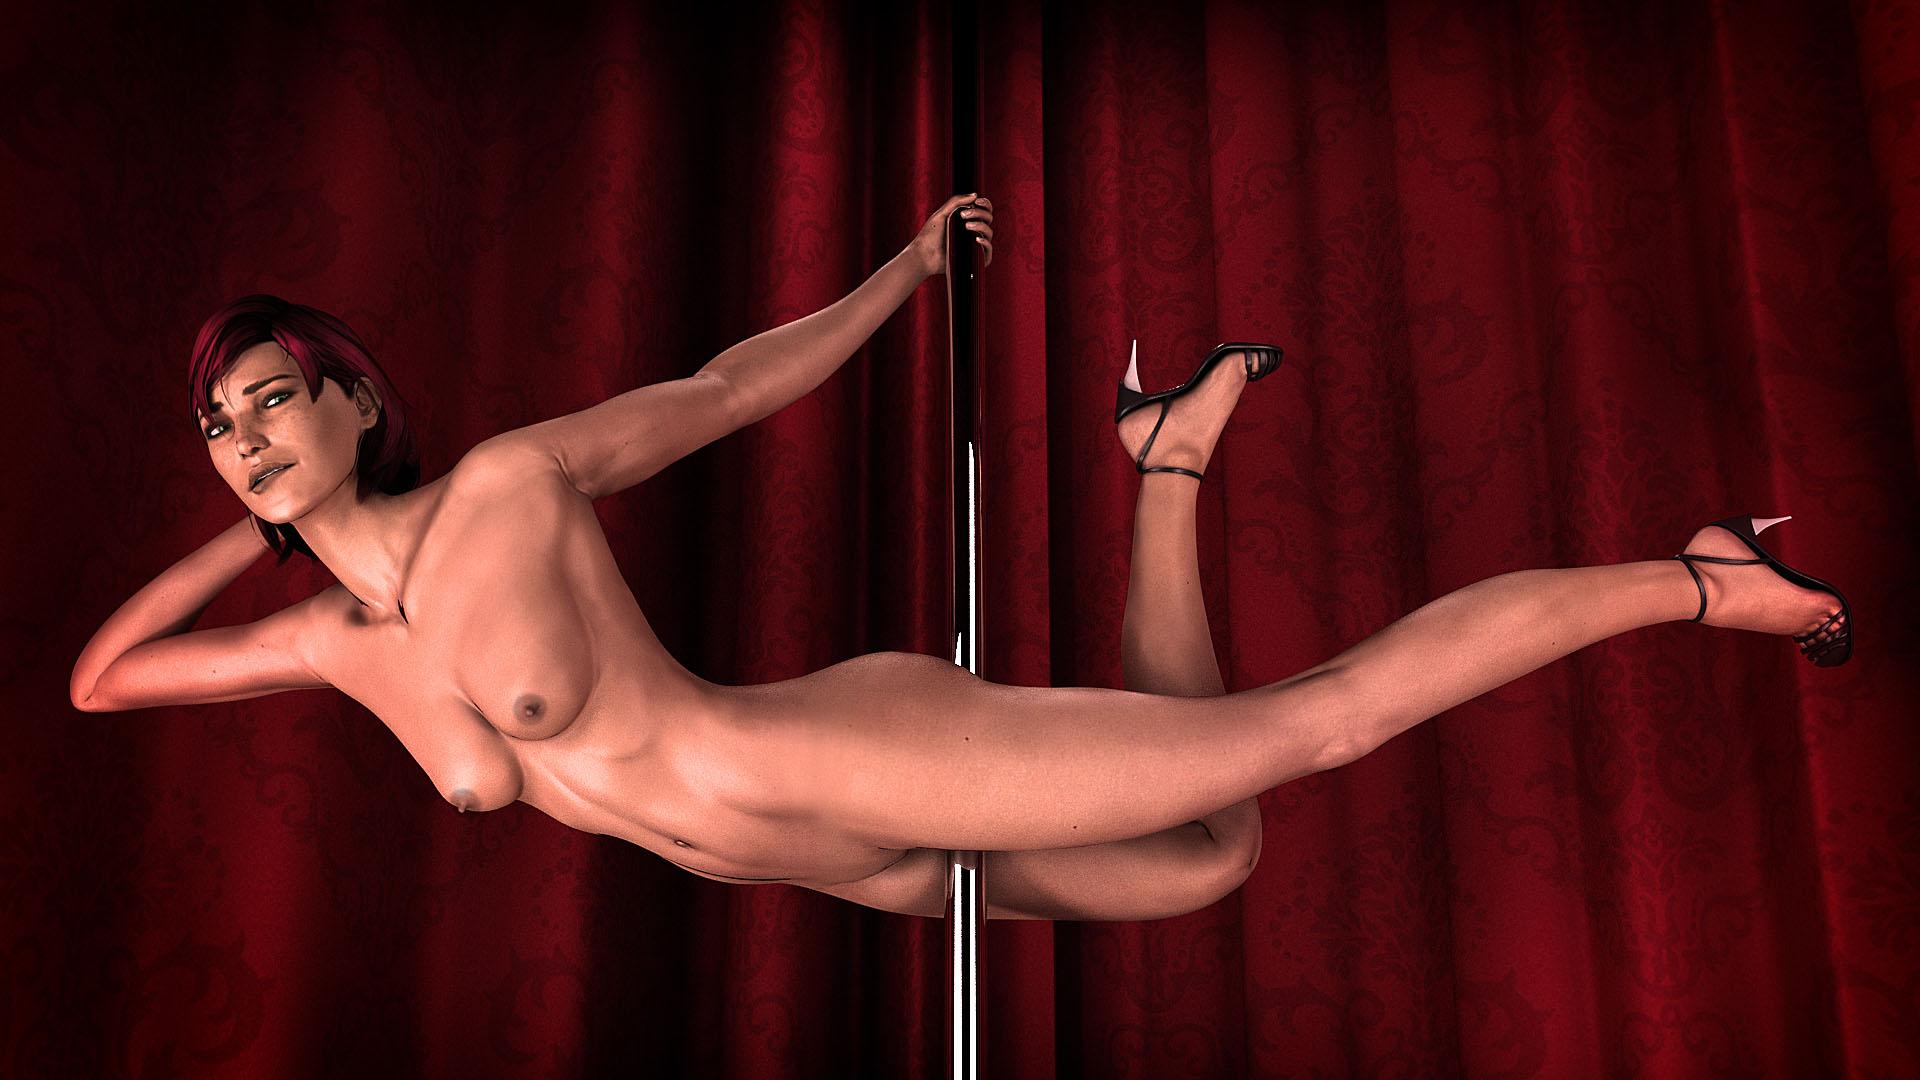 Шепард танцует стриптиз для Лиары - Эротика Mass Effect: http://masseffect-universe.com/images/mass_effect_erotic/shepard_tancuet_striptiz_dlja_liary/17-0-17310